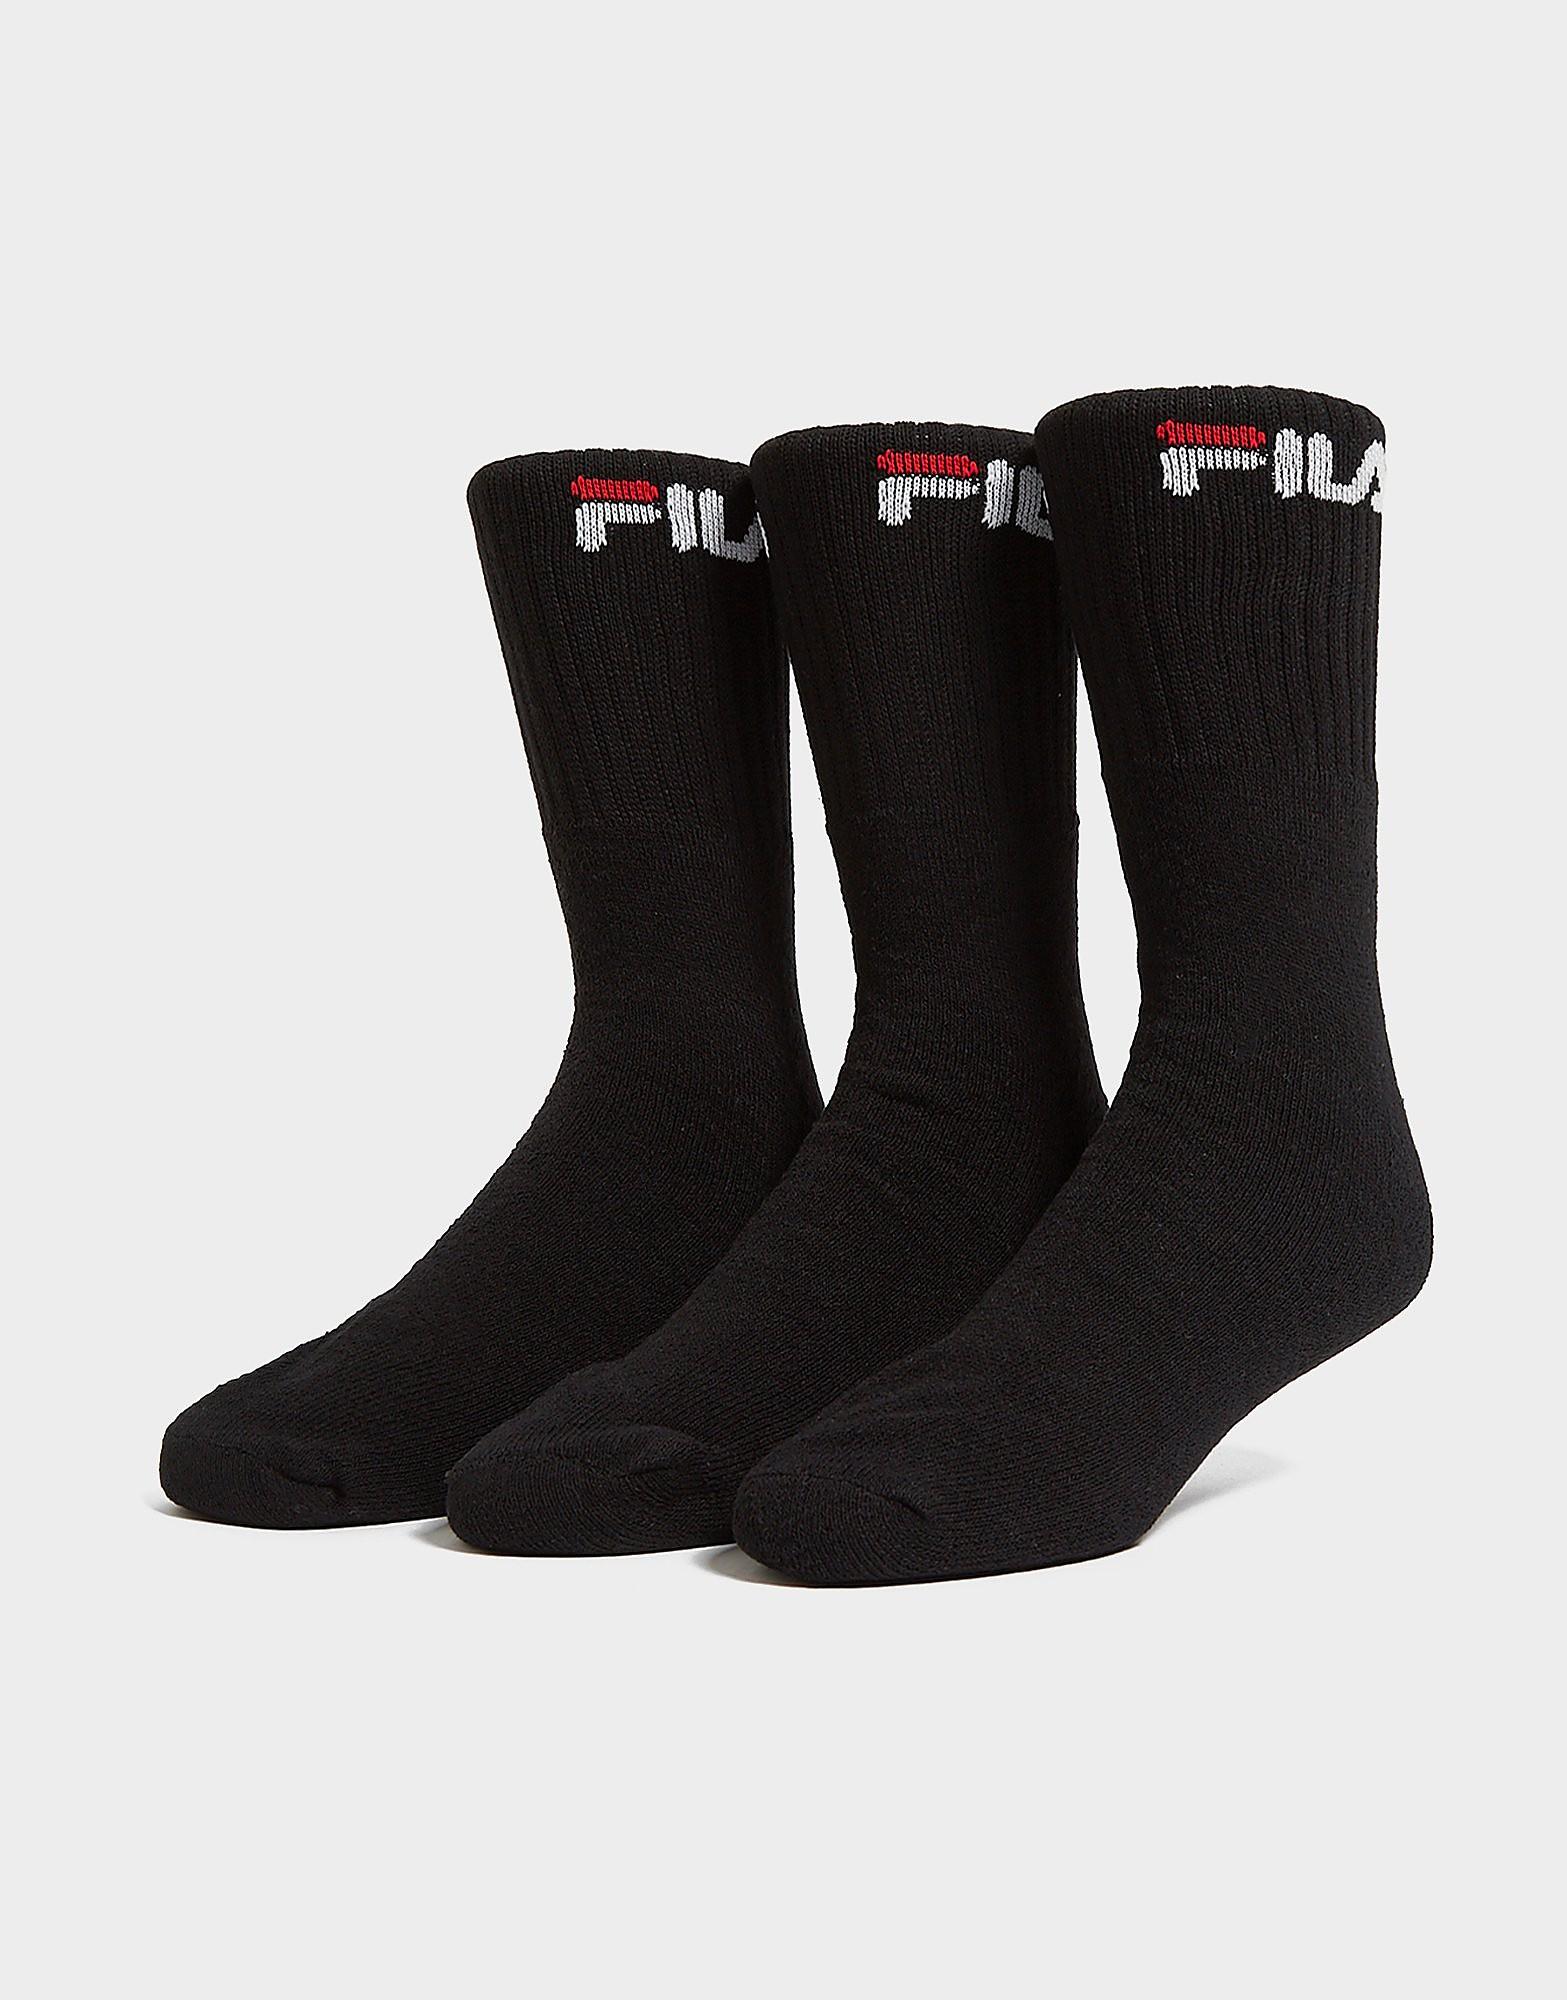 Fila pack de 3 calcetines Sport